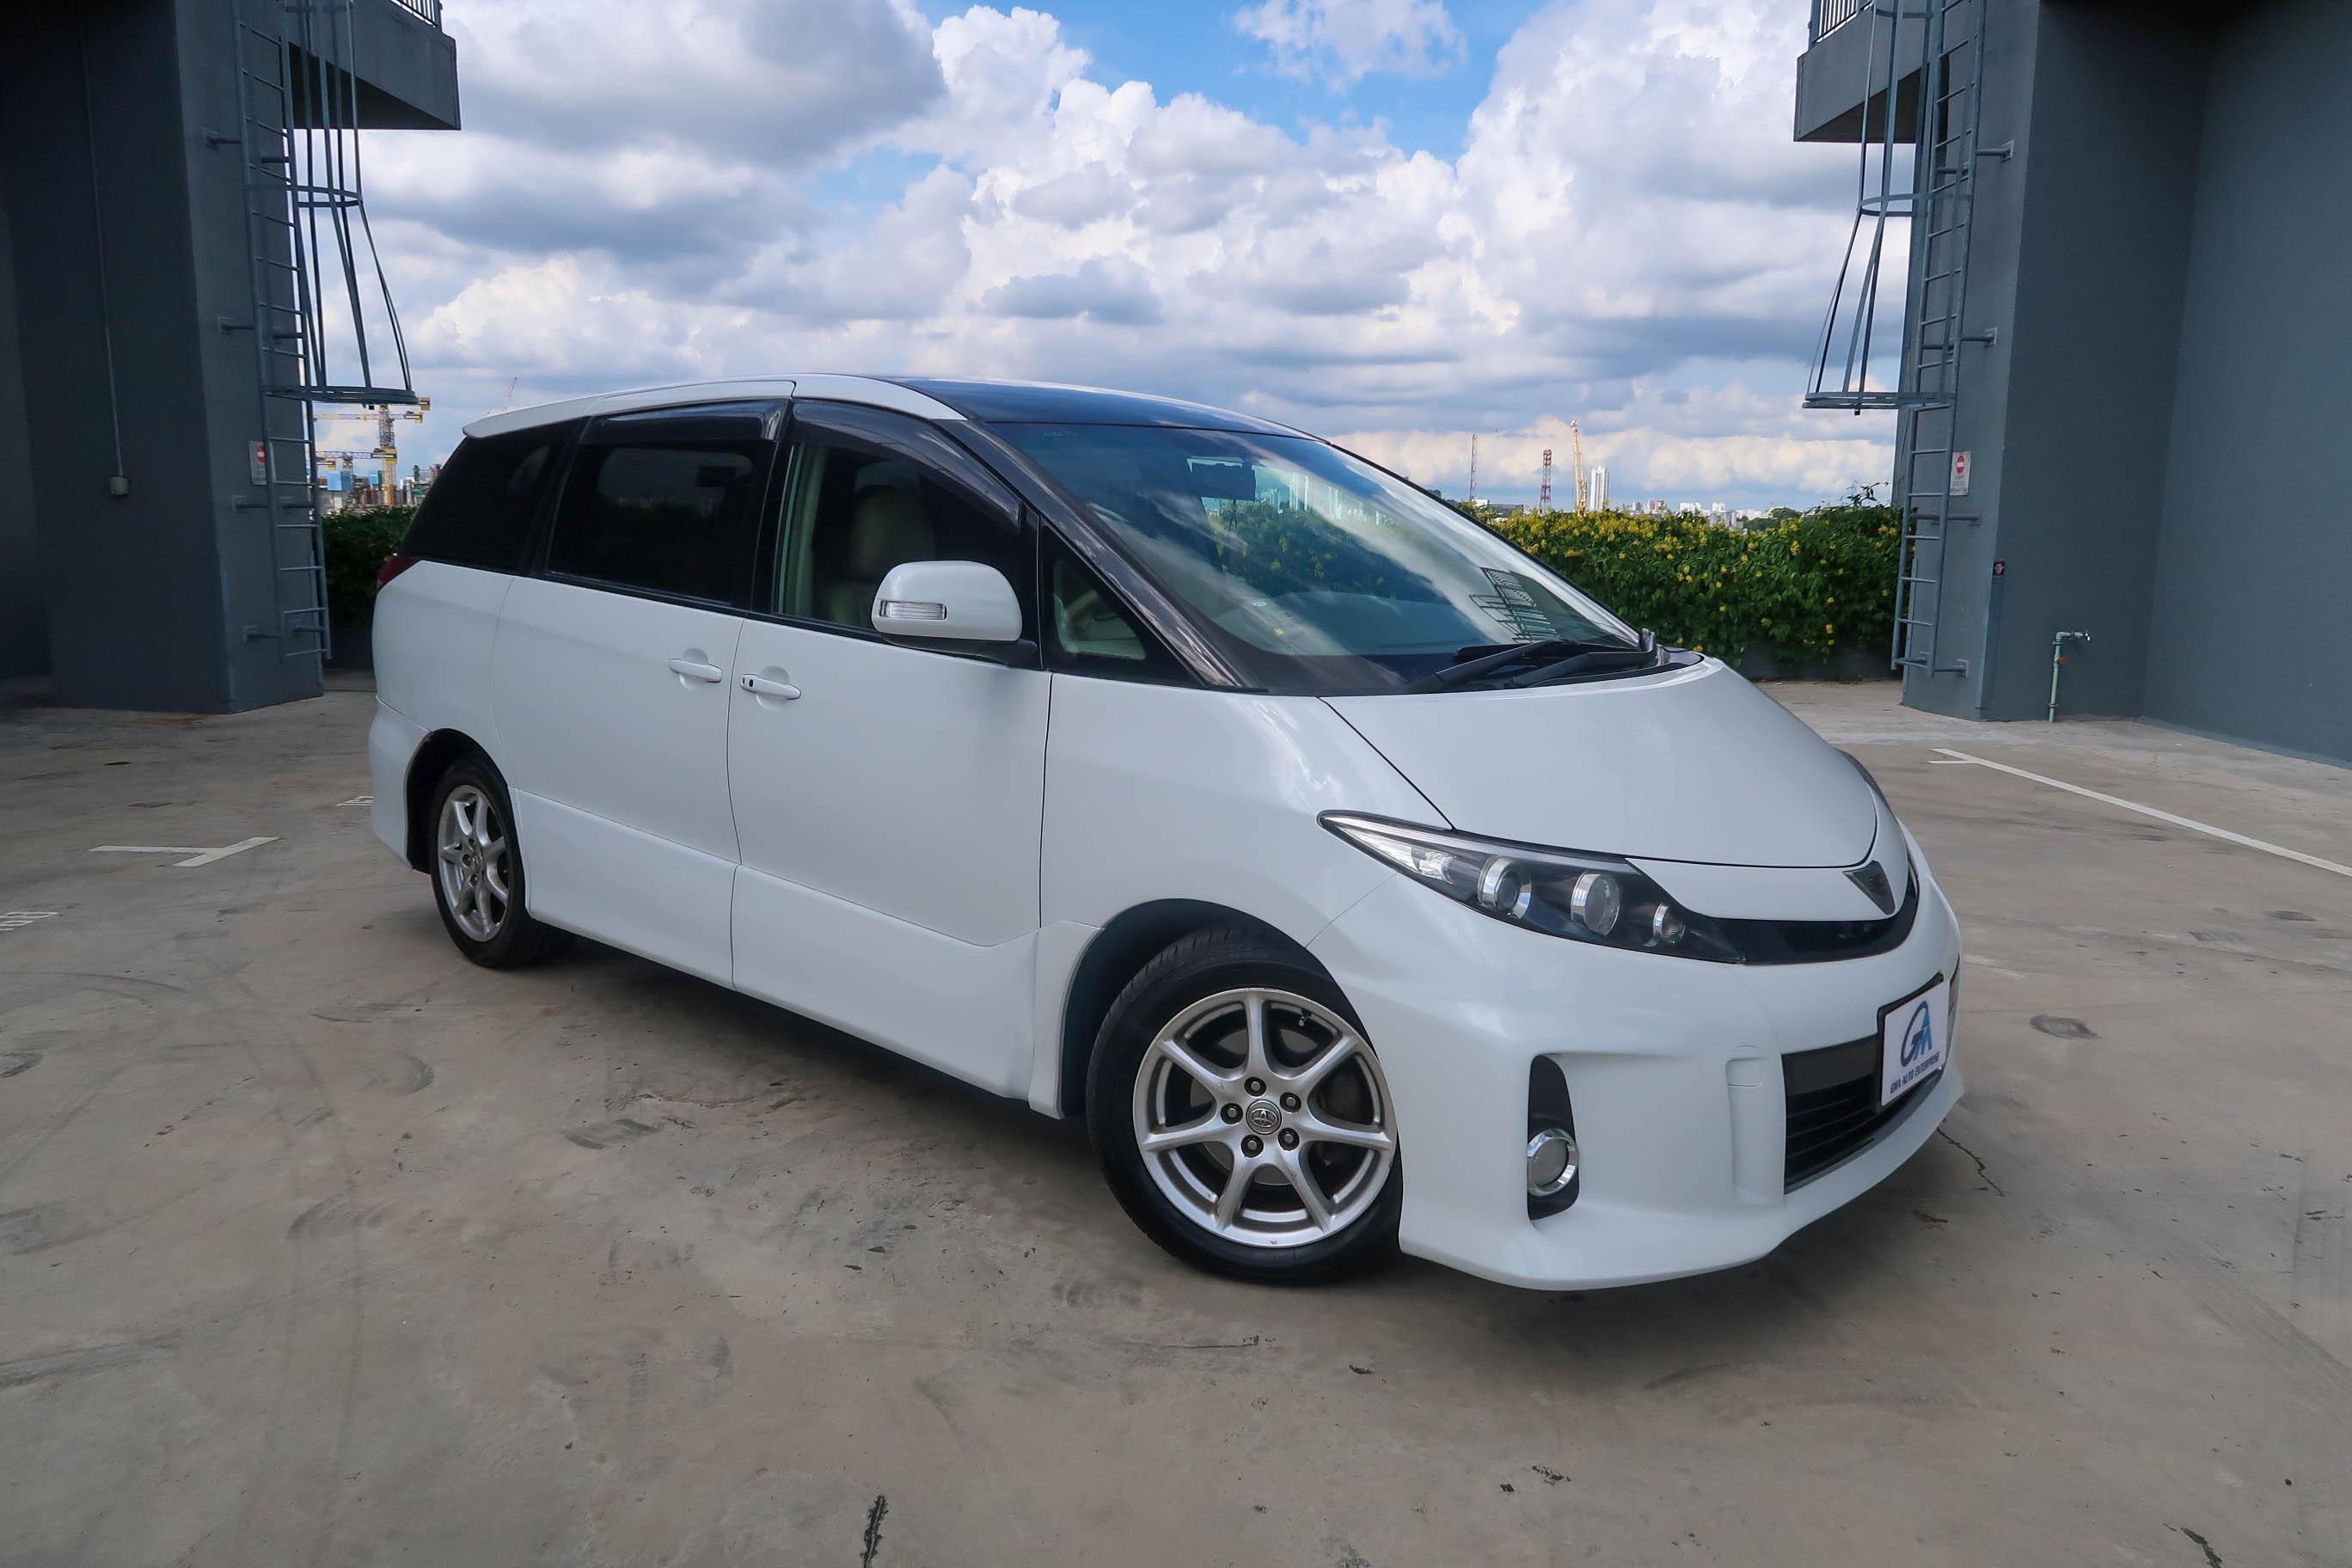 Toyota Estima (PH Ready)